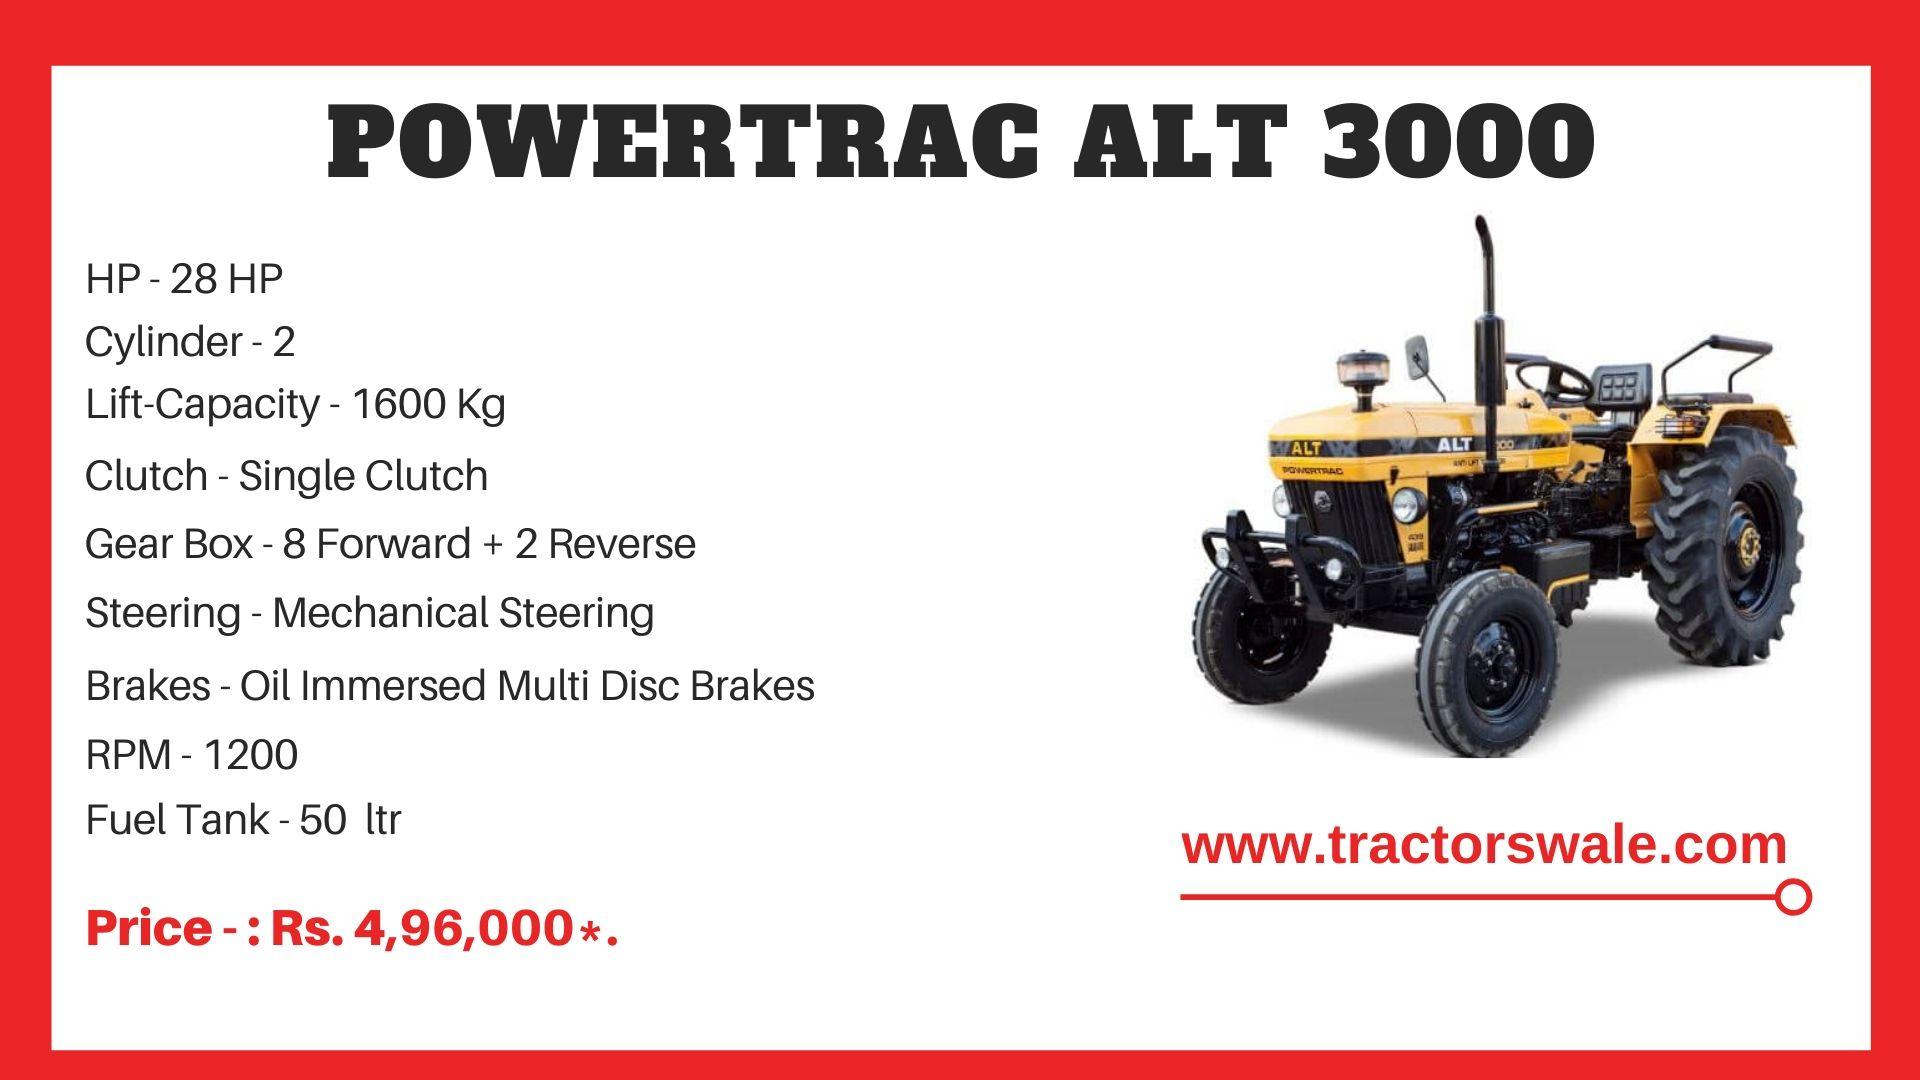 PowerTrac ALT 3000 tractor price